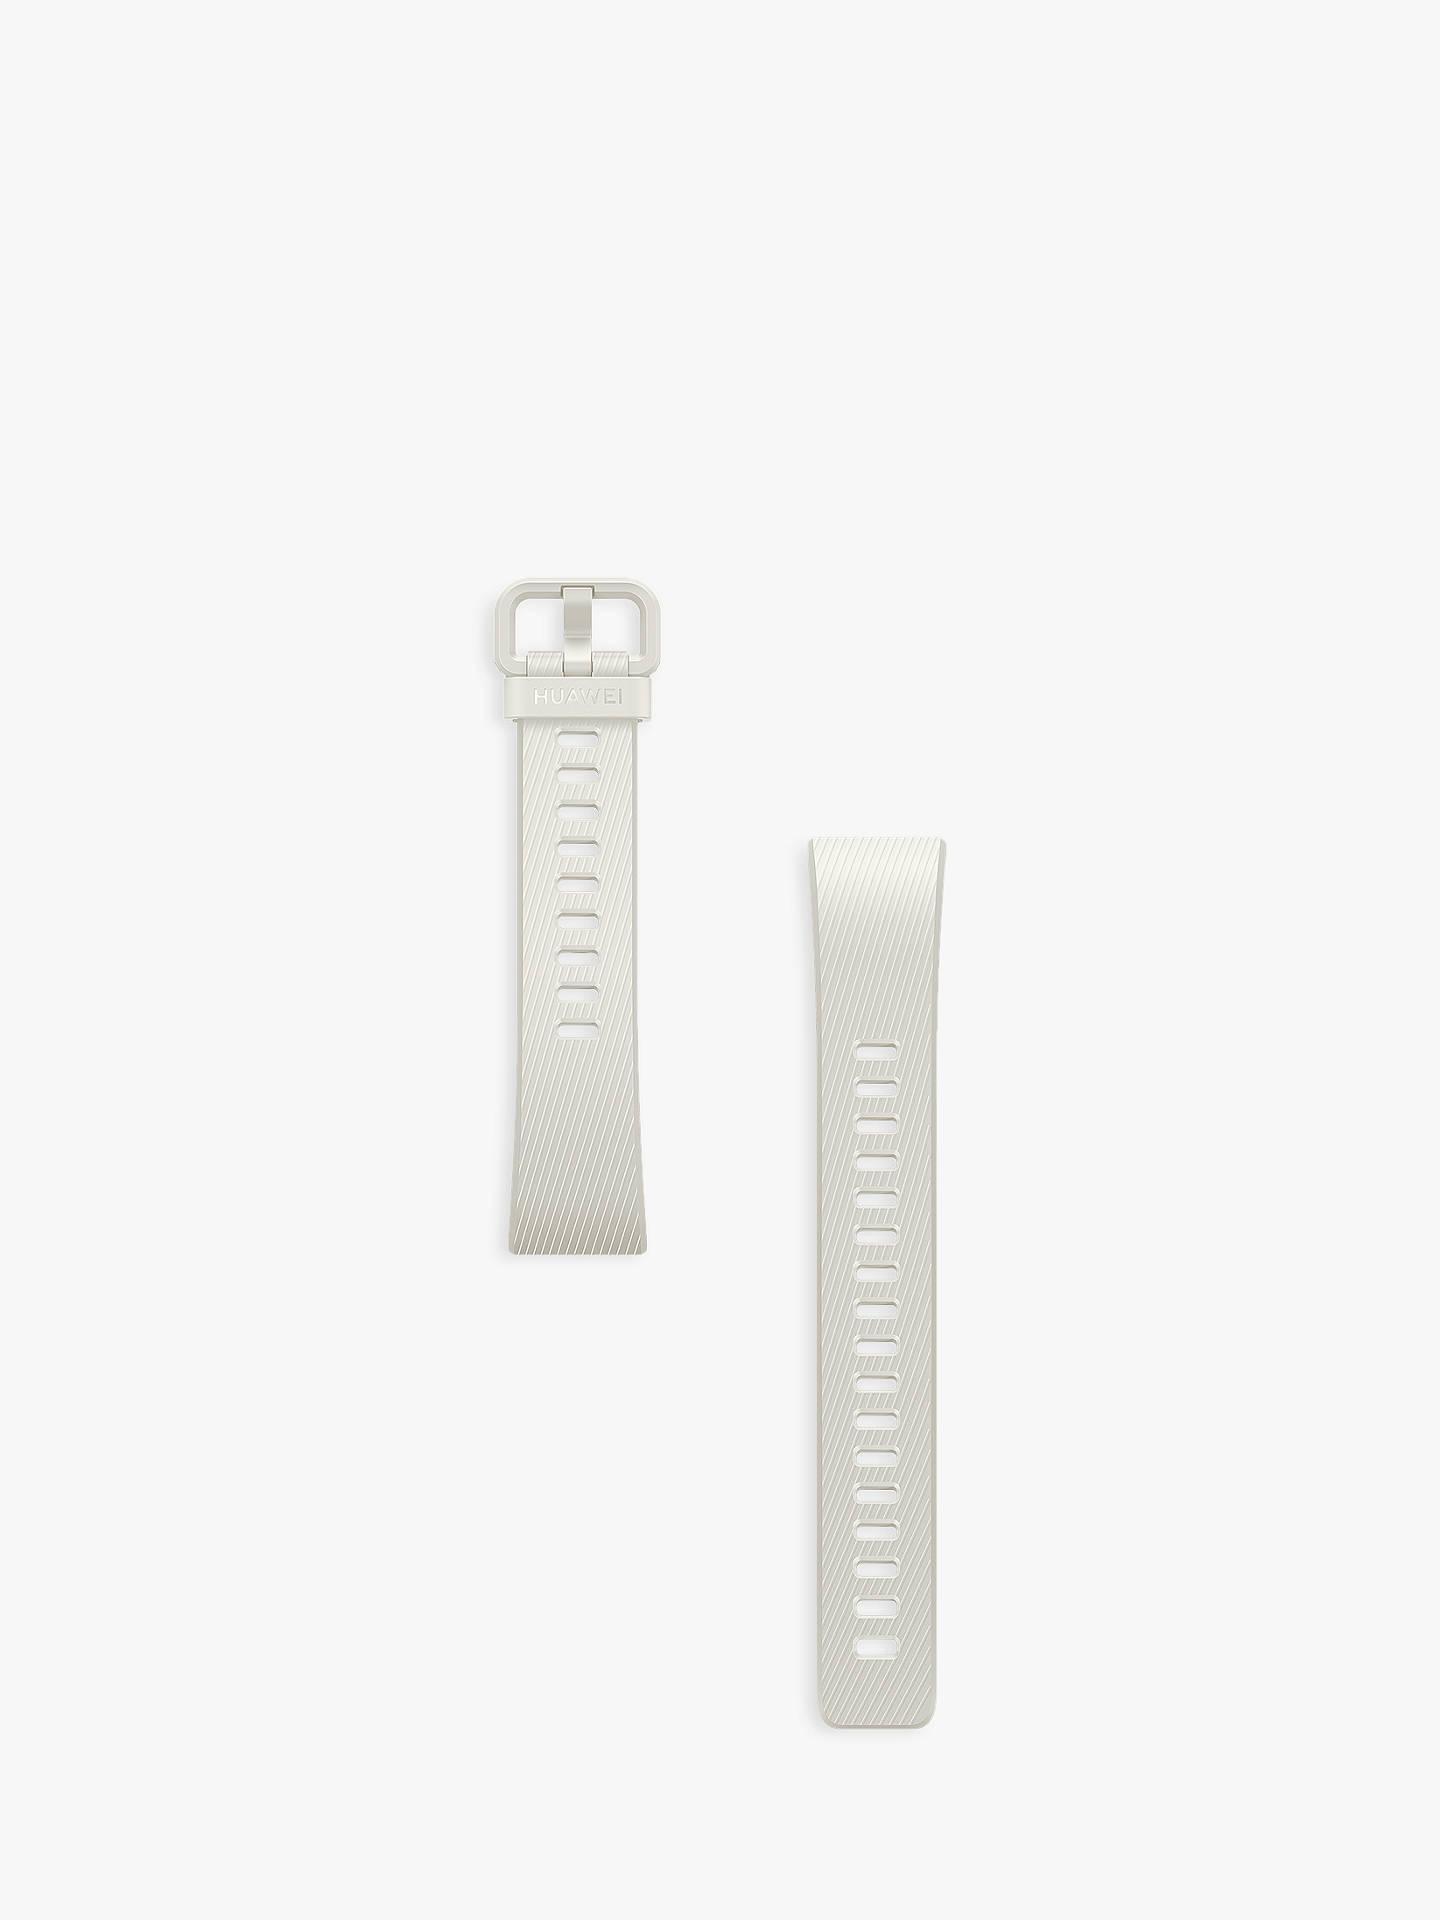 Huawei Band 3 Pro Fitness Tracking Wristband, White/Gold